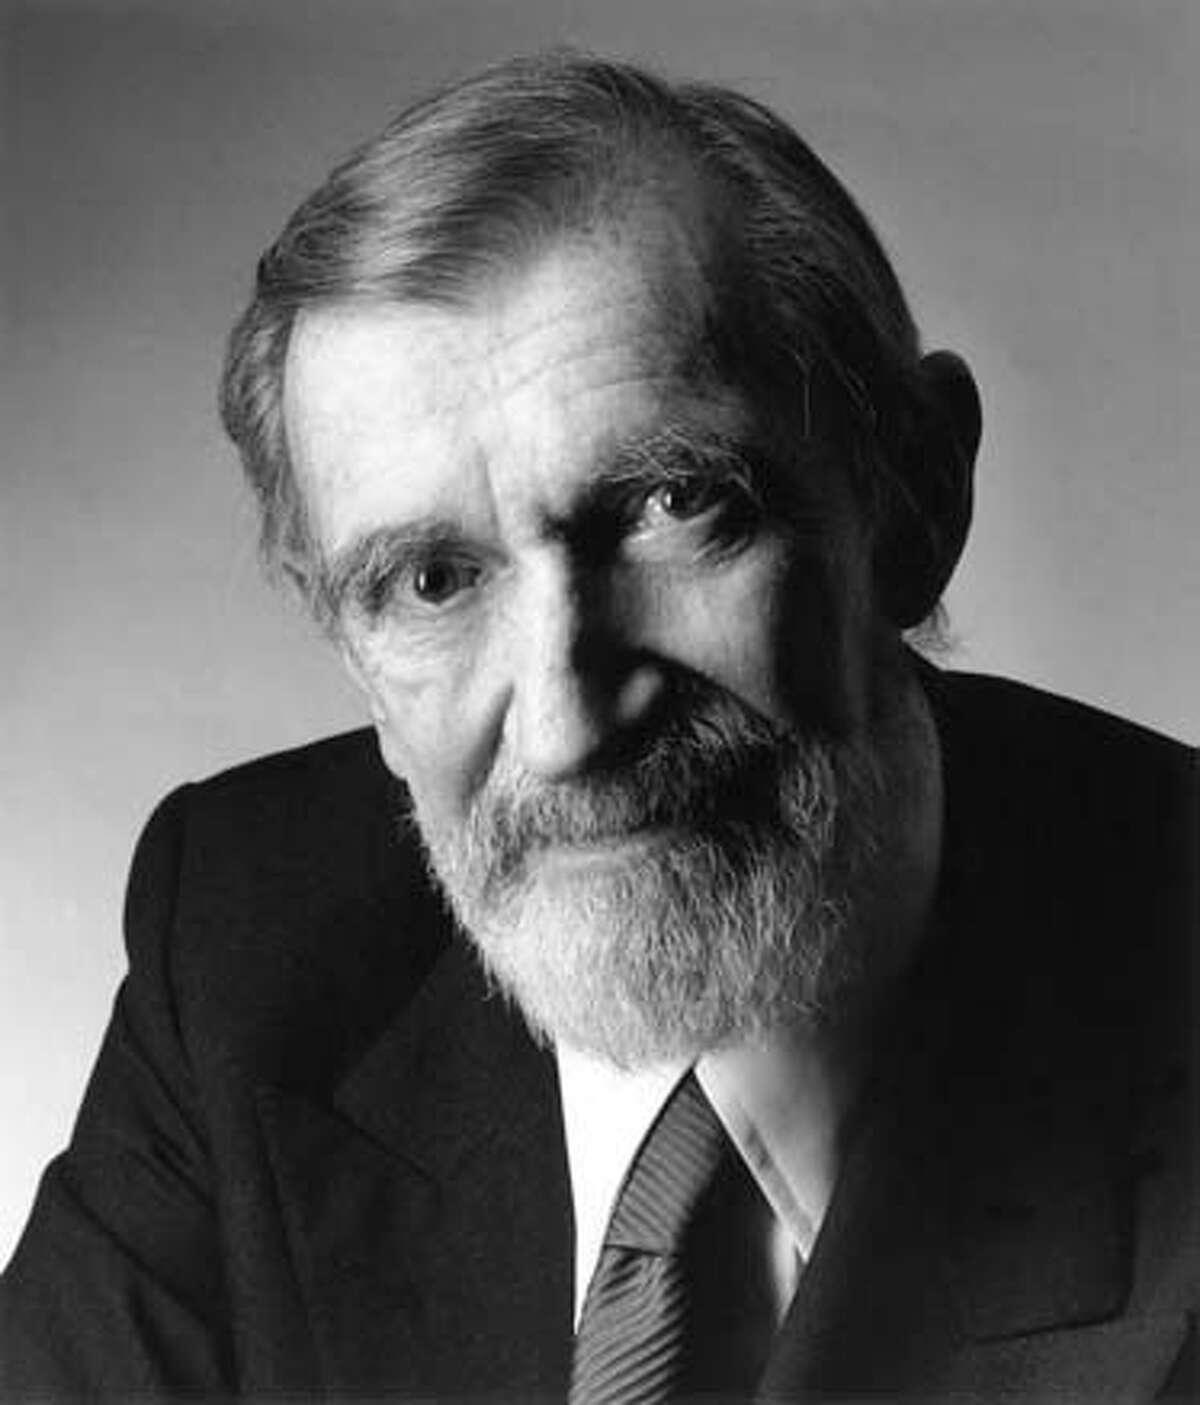 Obituary photo of James Freed.